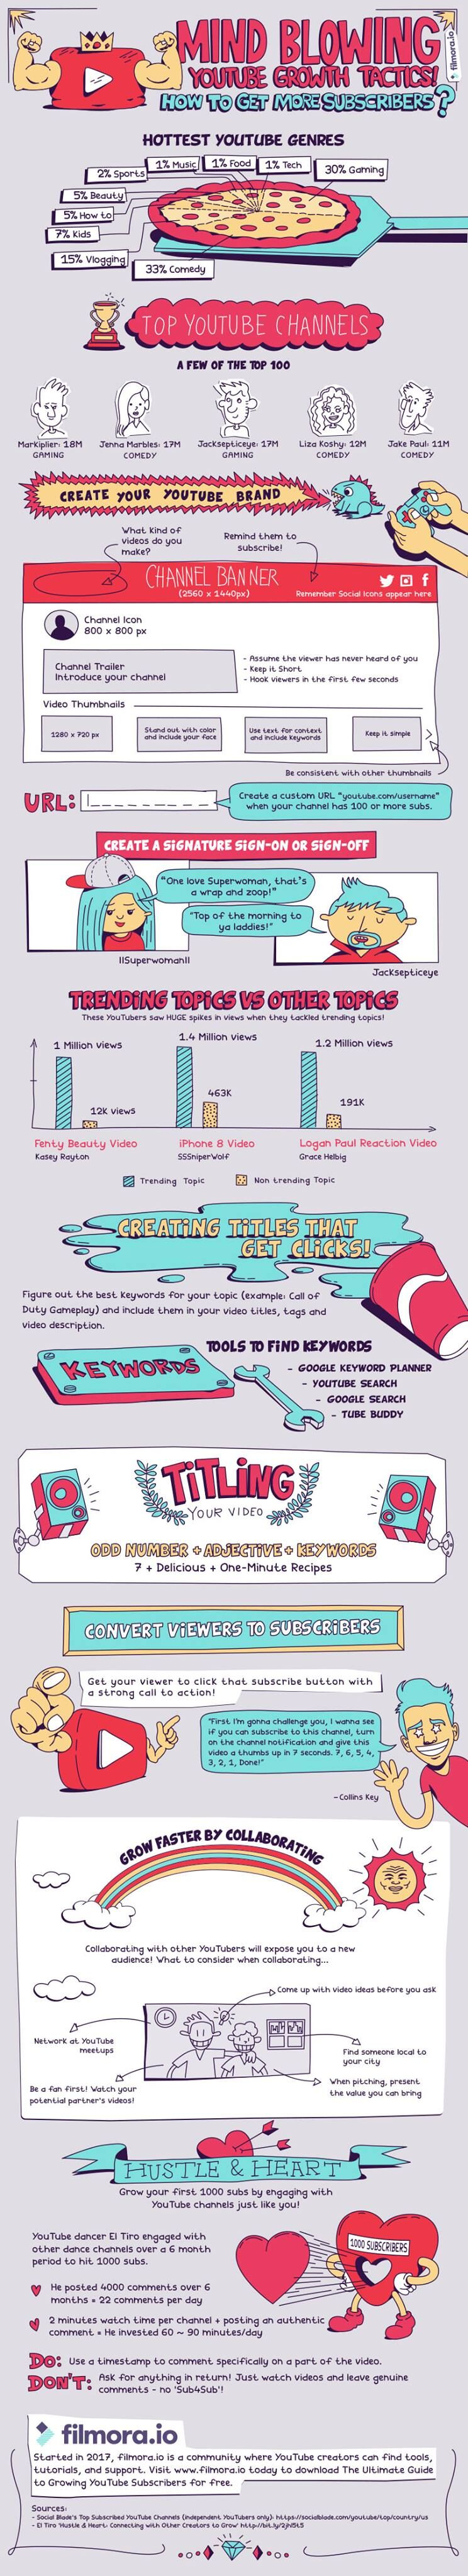 Infographic: Earn YouTube Subscribers